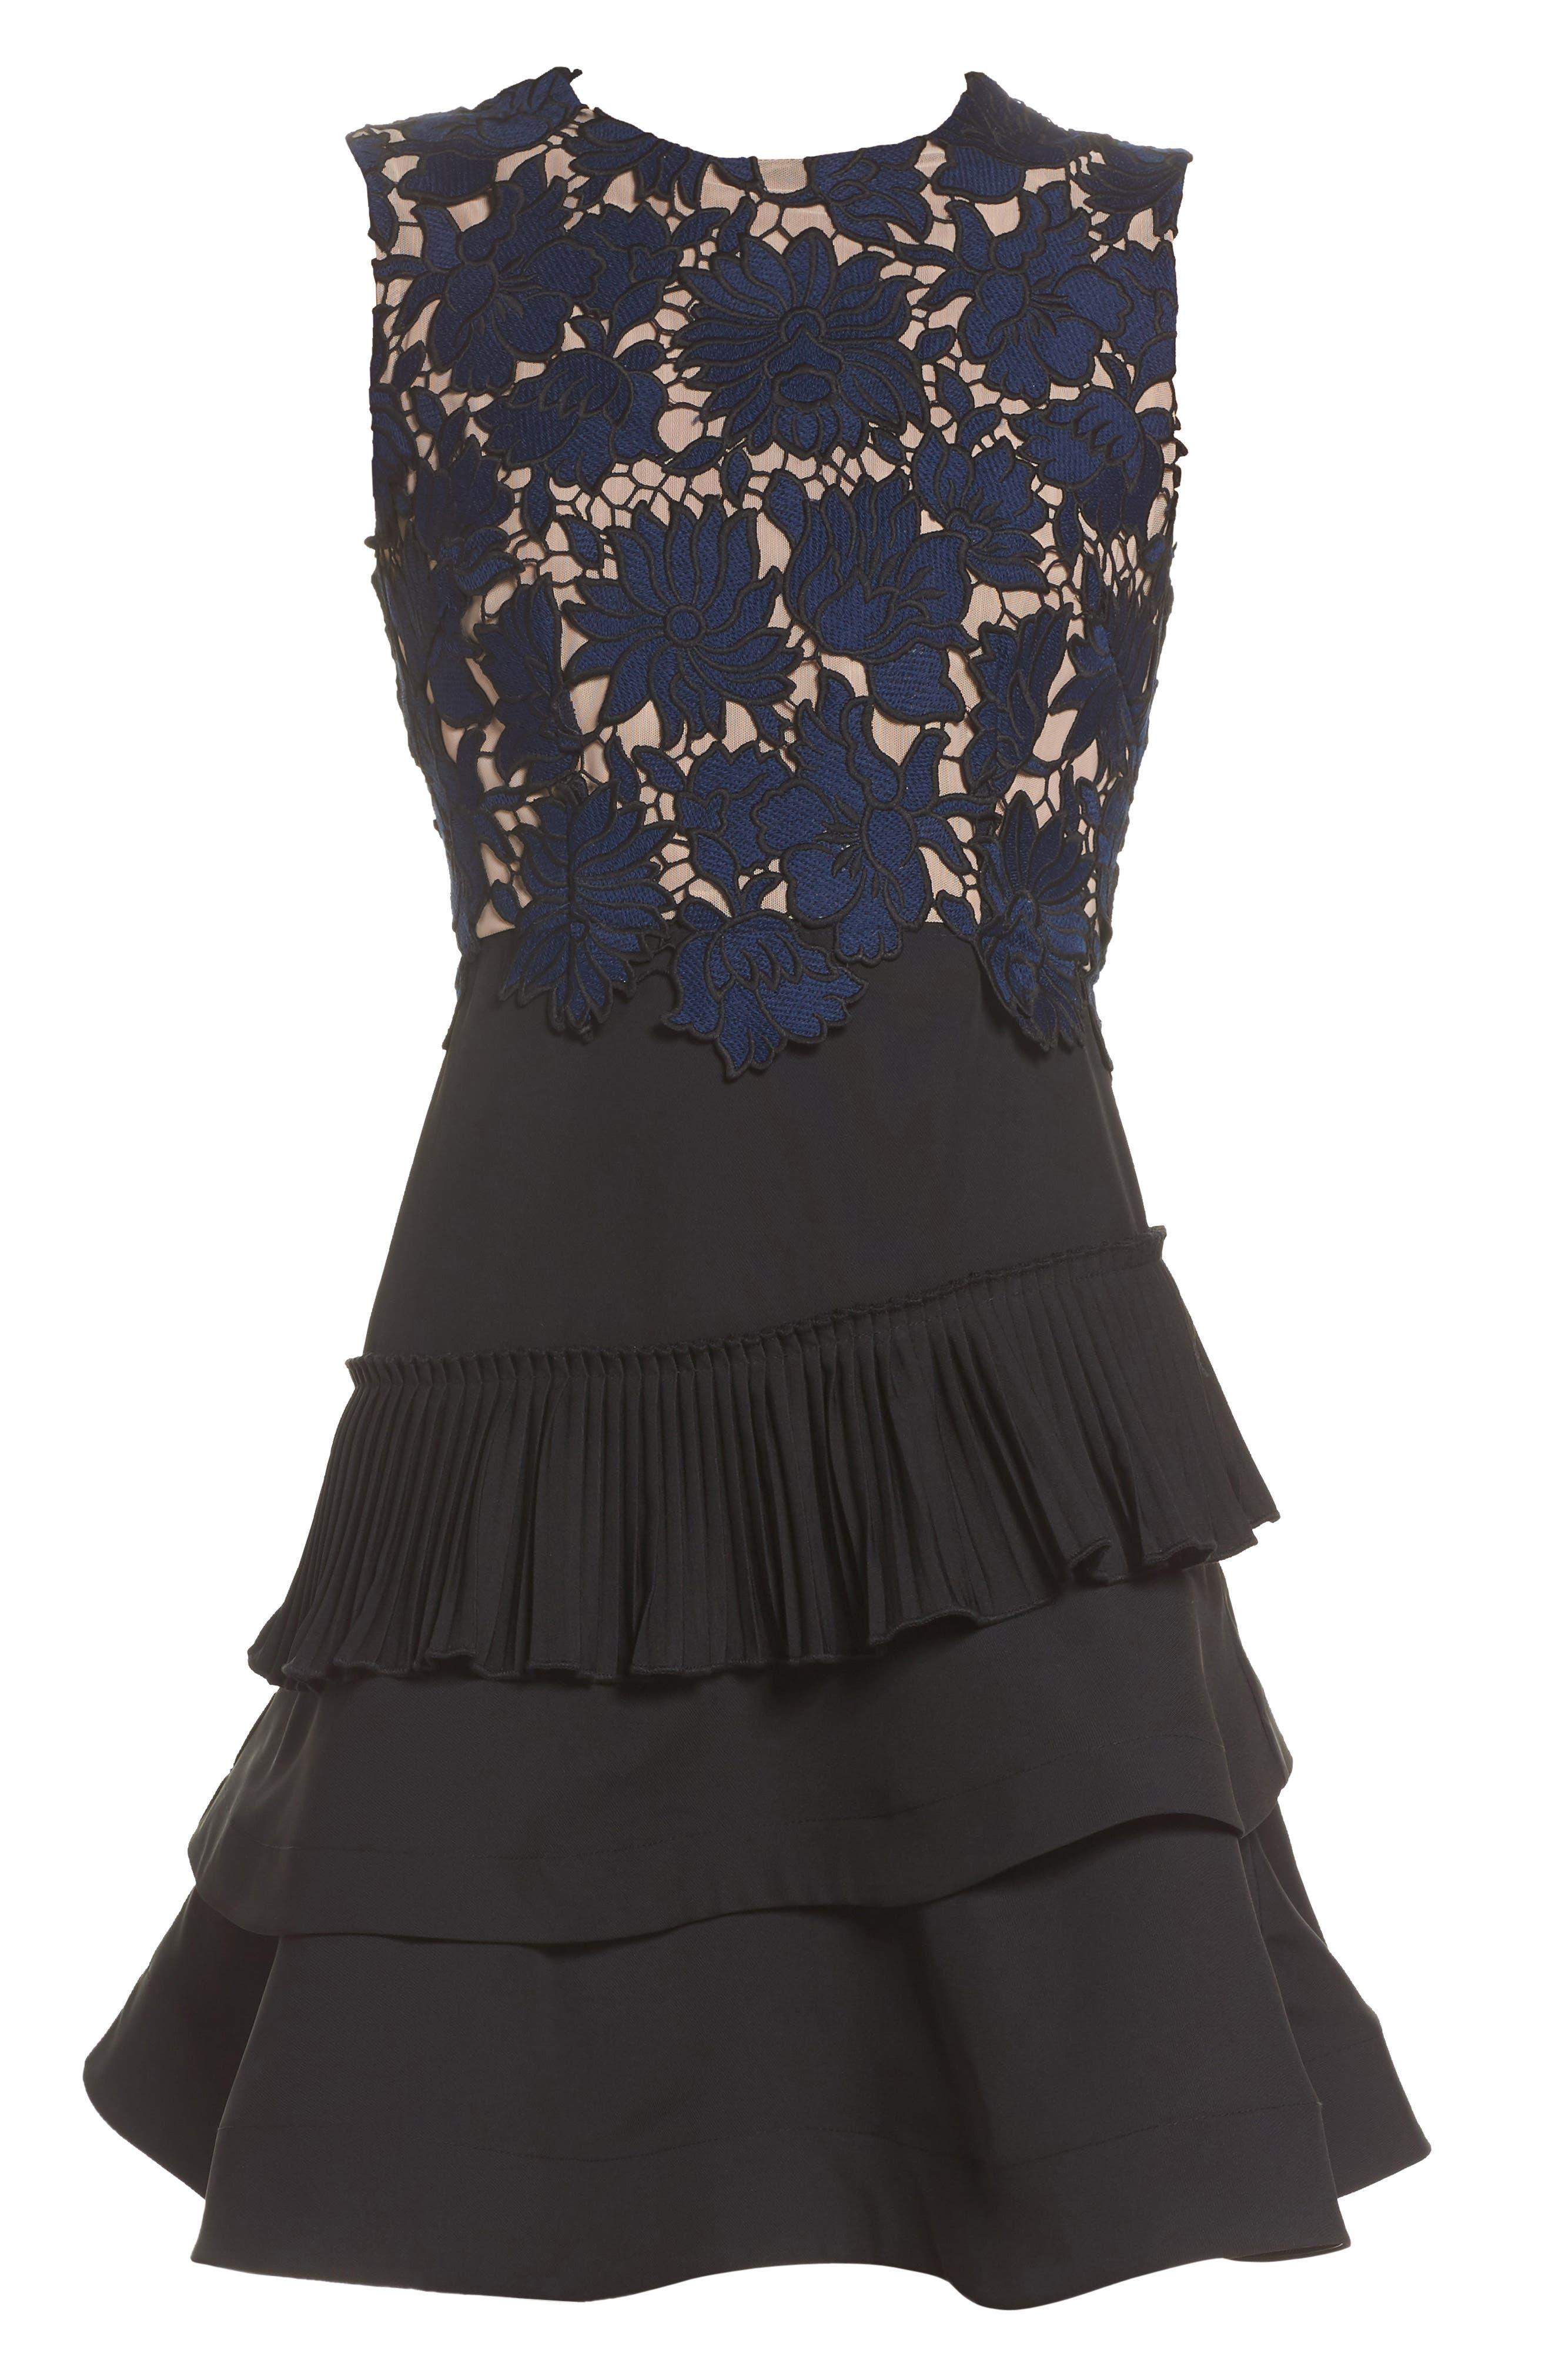 Alexa Lace & Ruffle Tier Dress,                             Alternate thumbnail 7, color,                             Black/ Navy